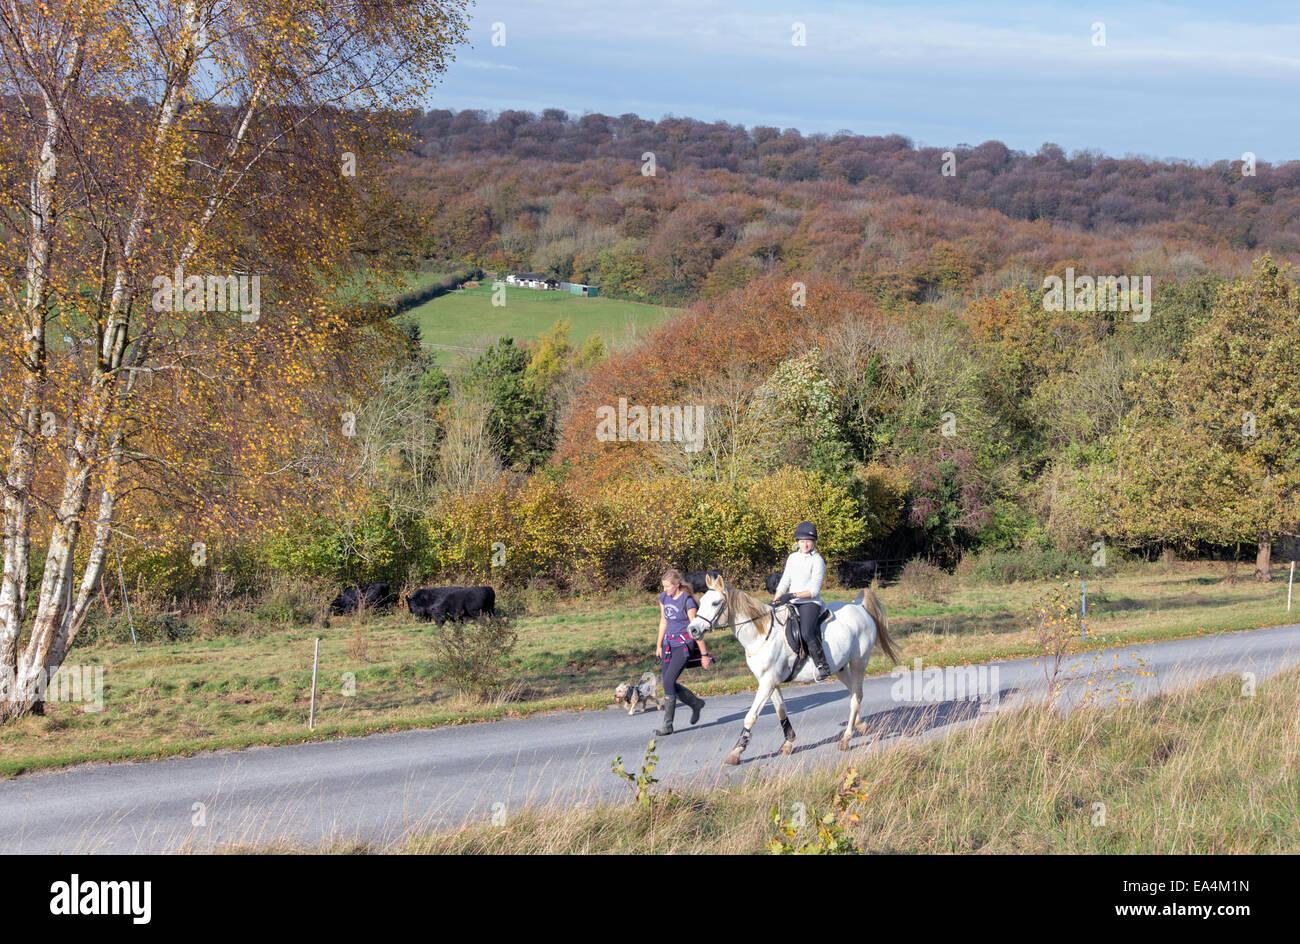 Autumn on Cranham Common part of Gloucestershire National Nature Reserves, Cranham, Gloucestershire, England, UK - Stock Image